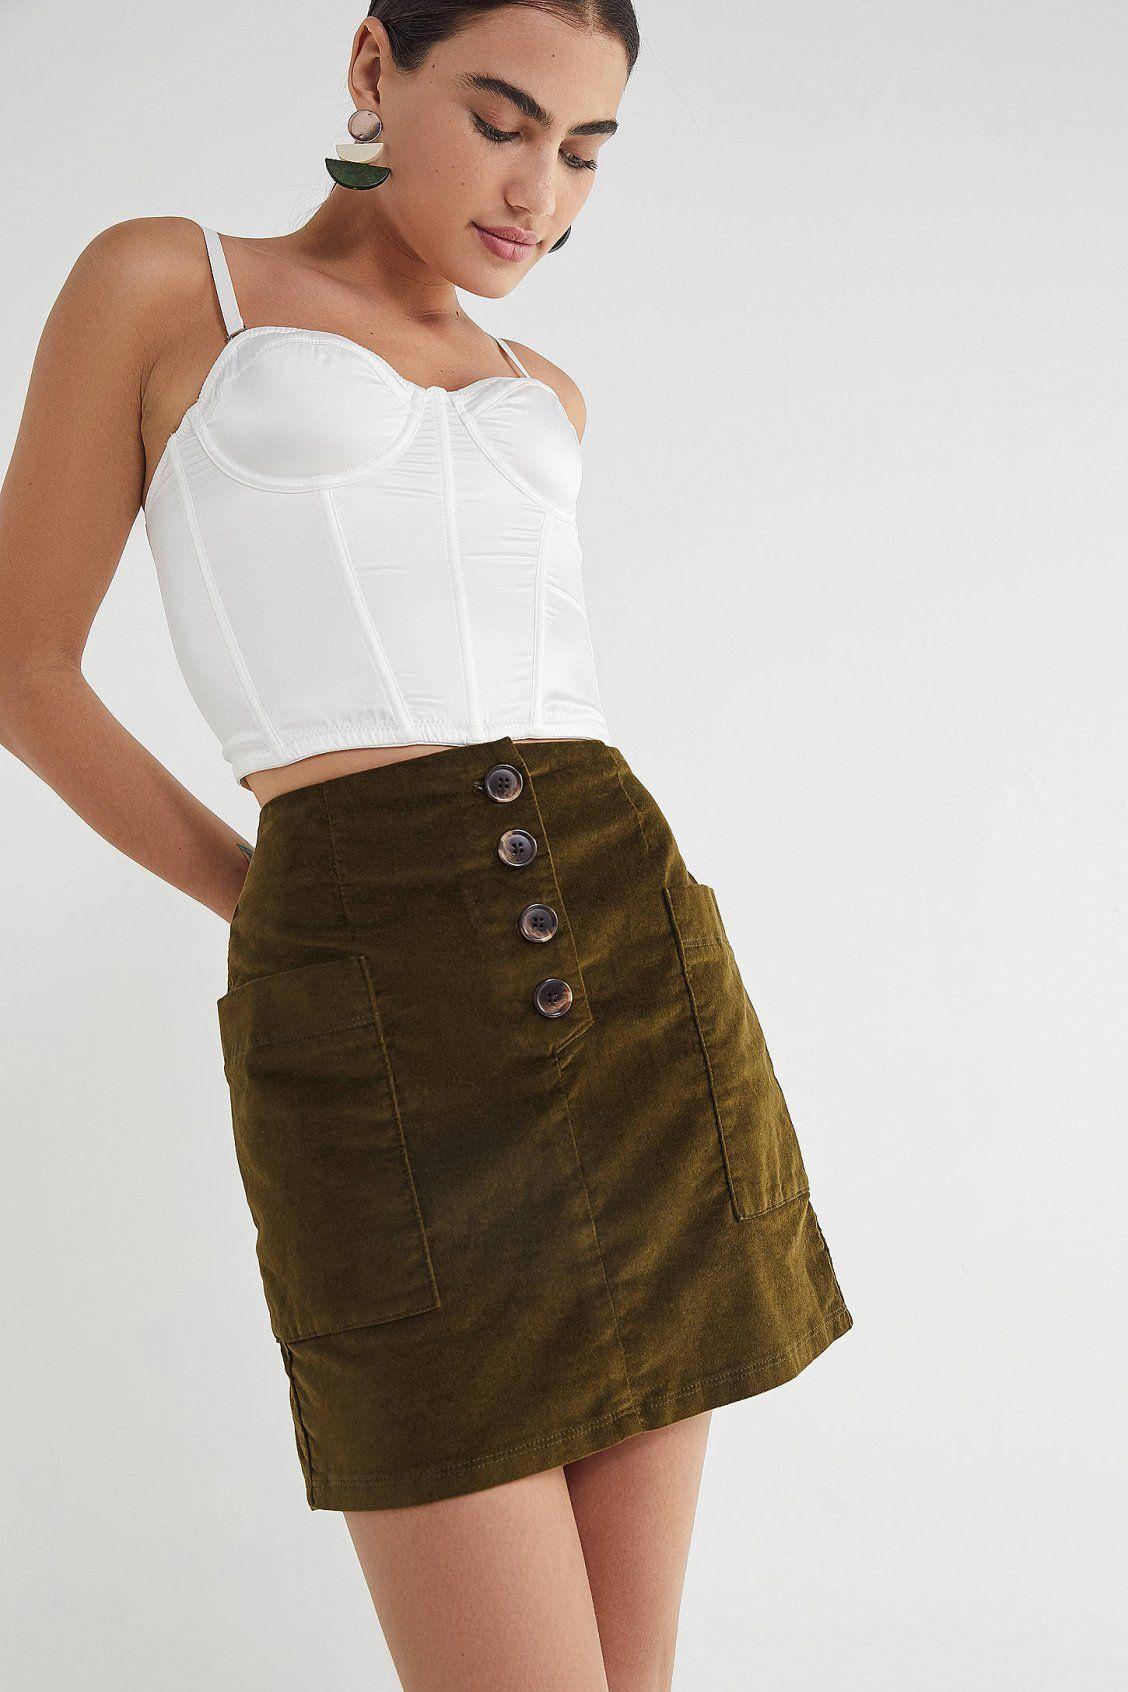 c25c3afdee BDG Kendri Uncut Corduroy Mini Skirt in 2019 | New Arrivals | Mini ...